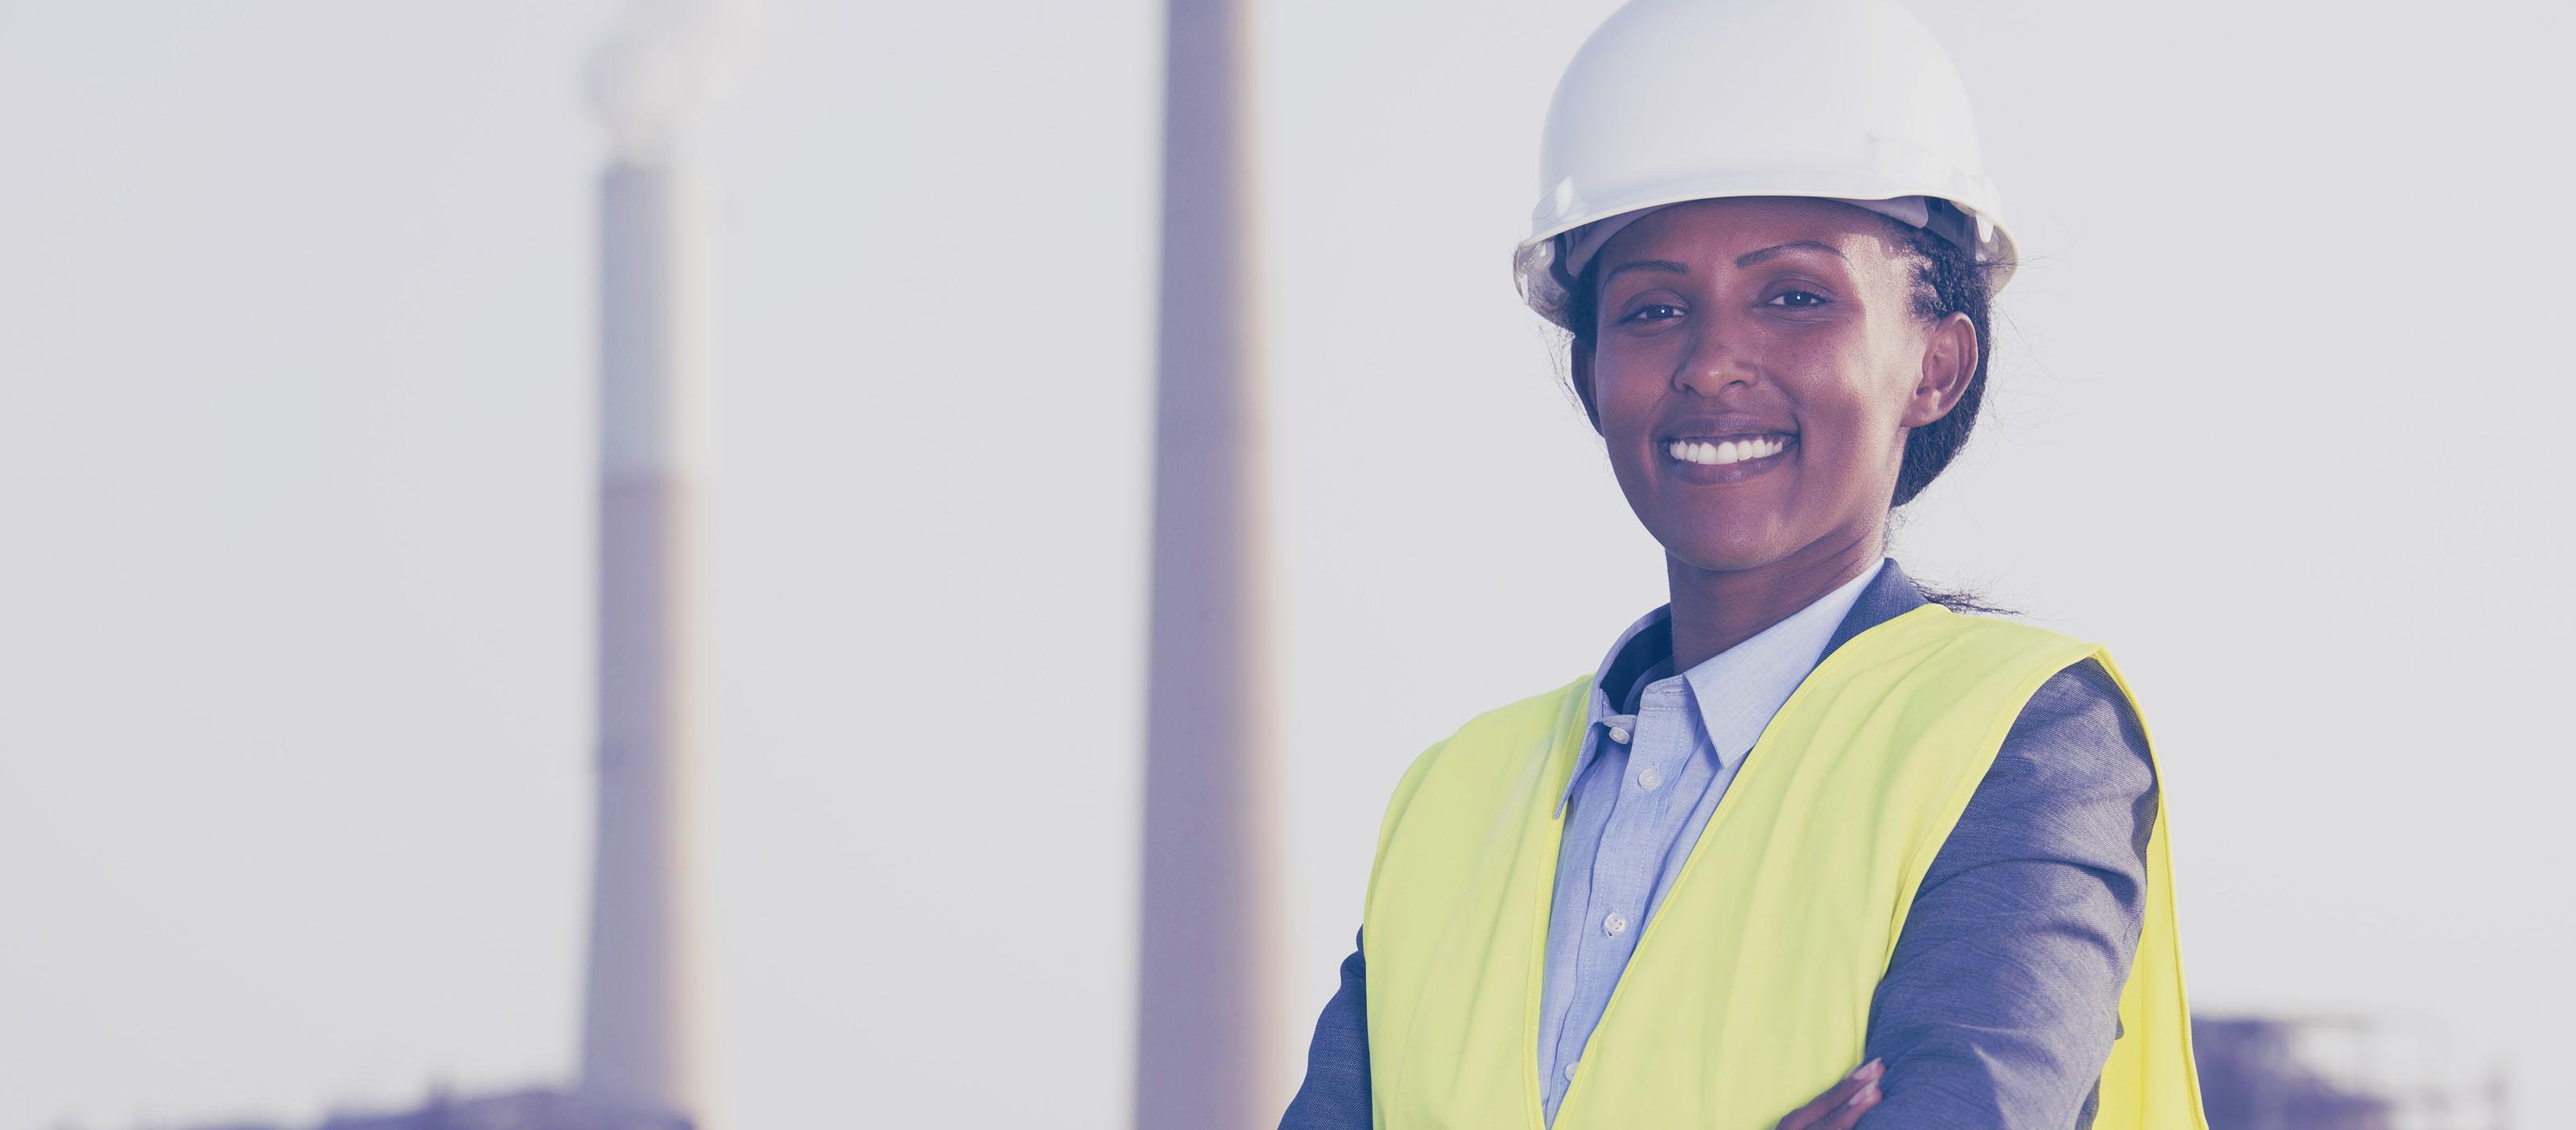 Software for utility workers | GE Digital | Digital Energy